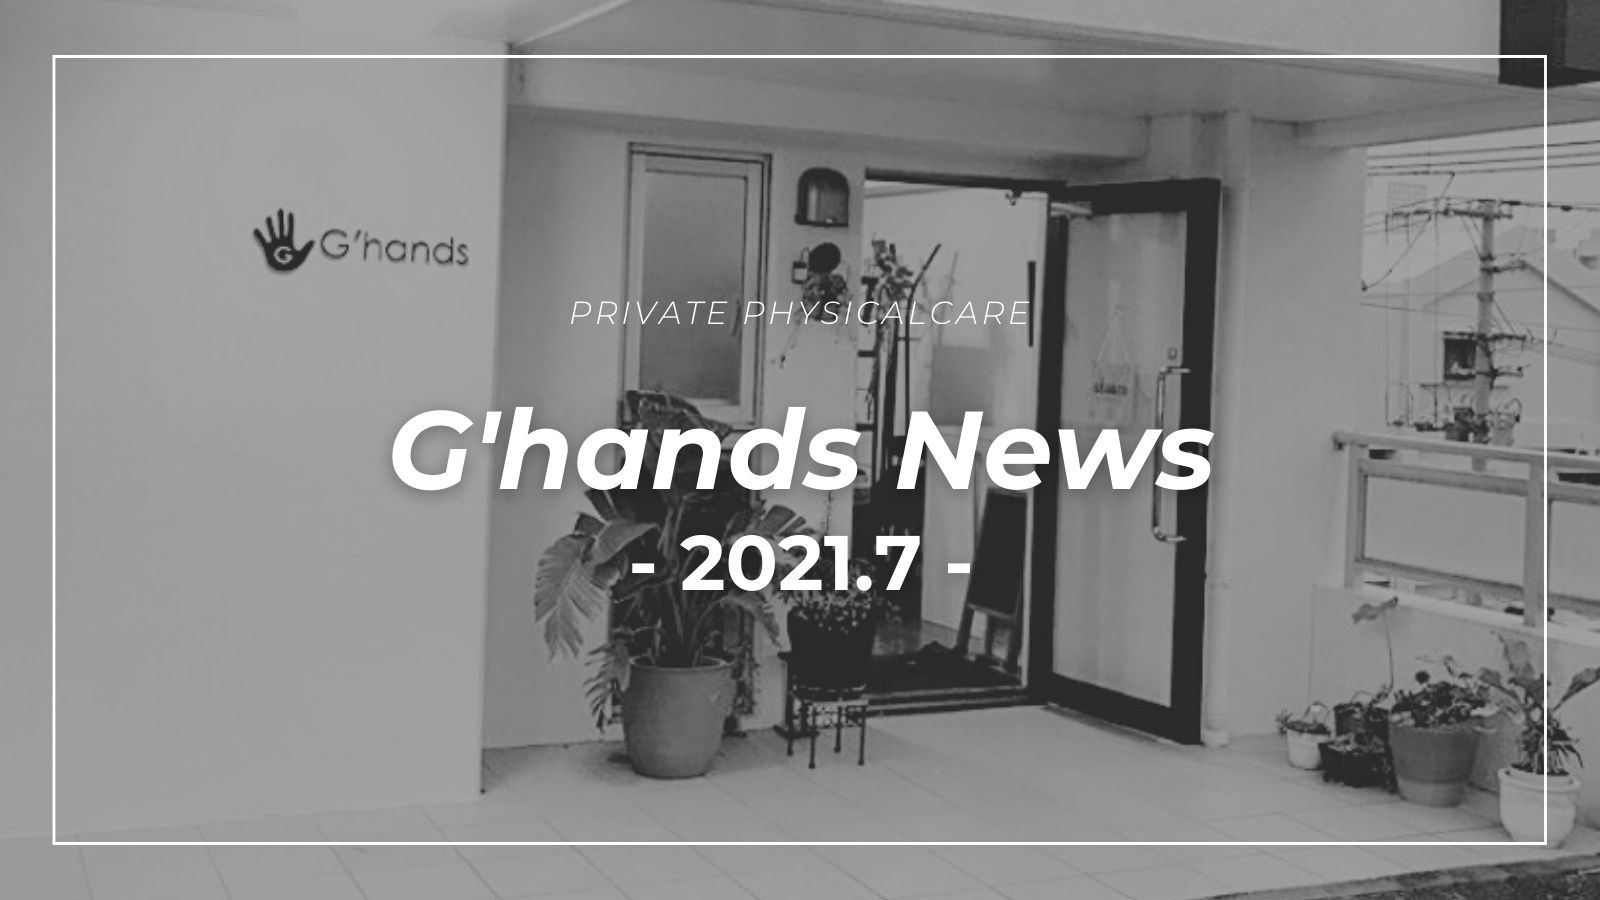 G'News 7月号 2021|ジーハンズのちょっとした話。